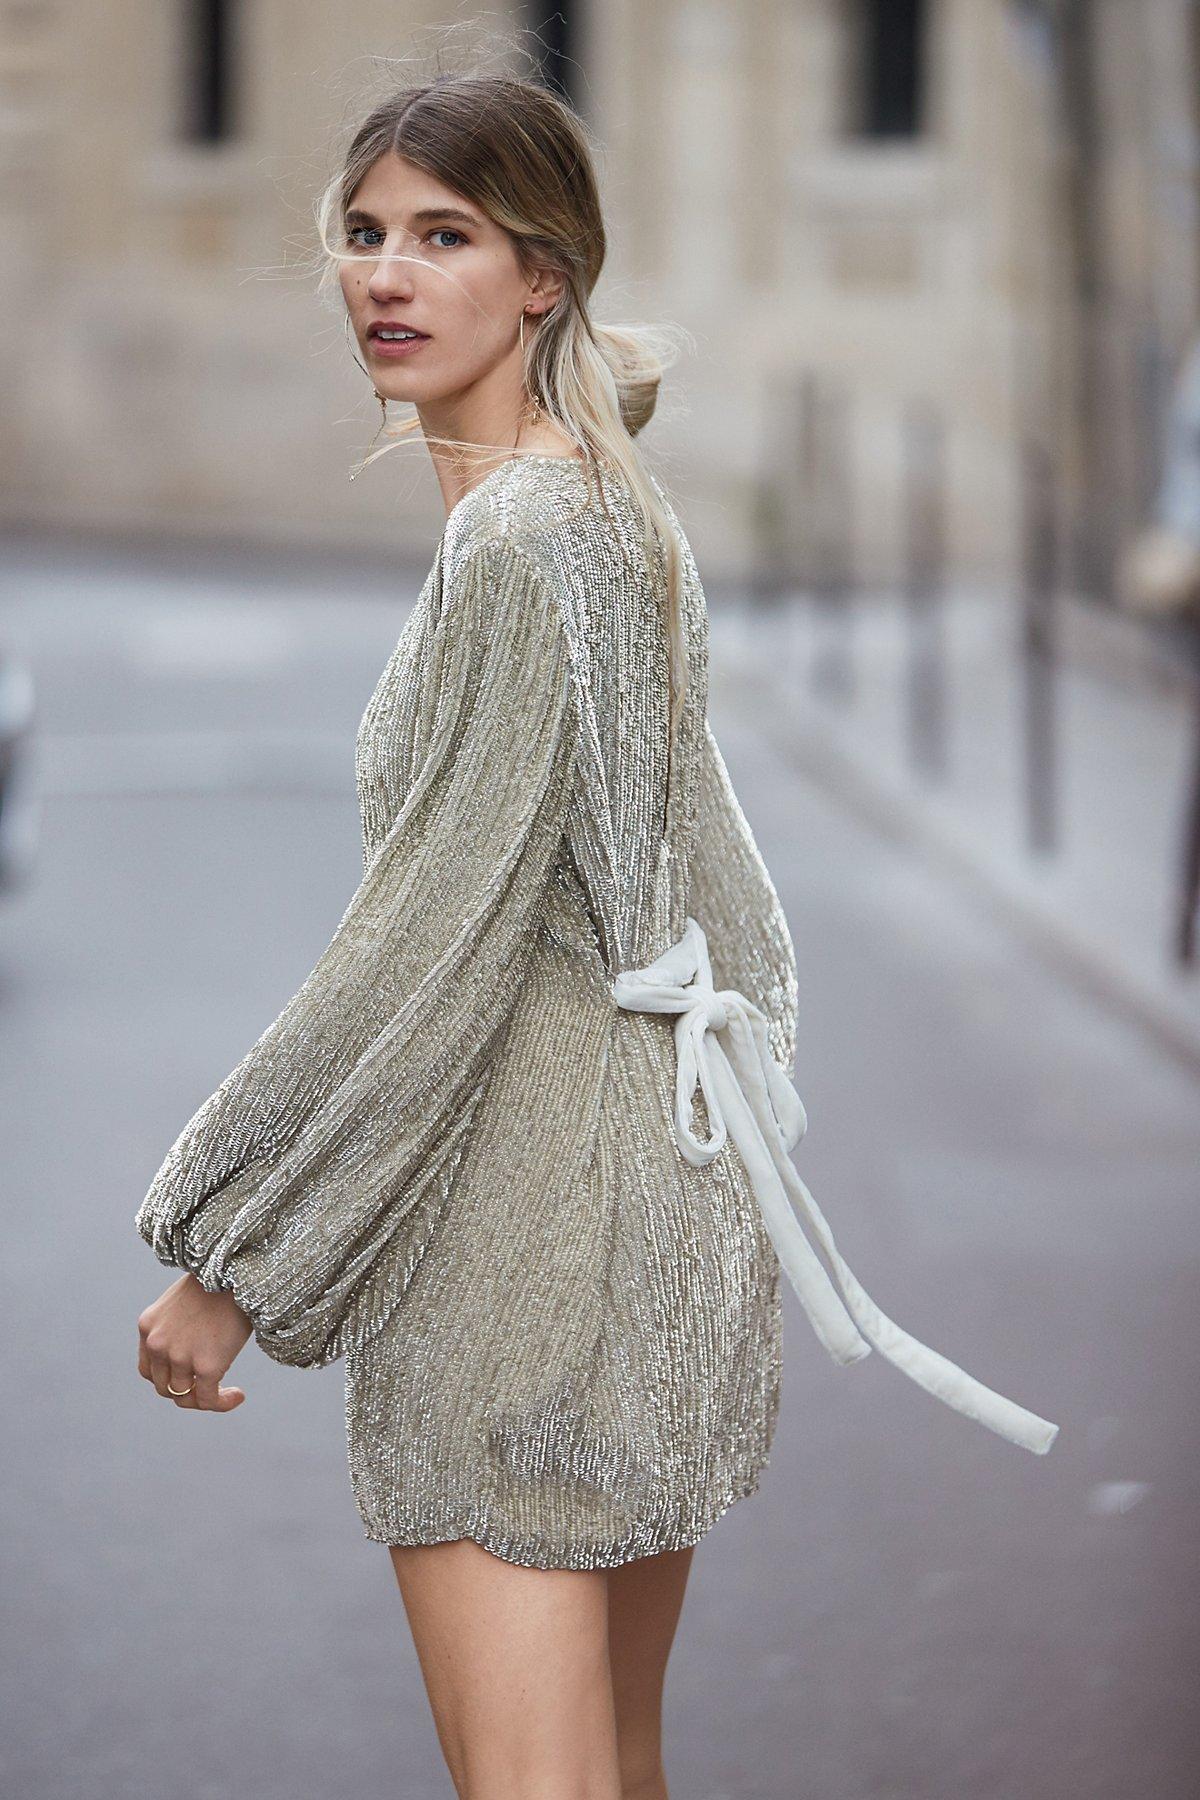 Moonglow Sequin Mini Dress